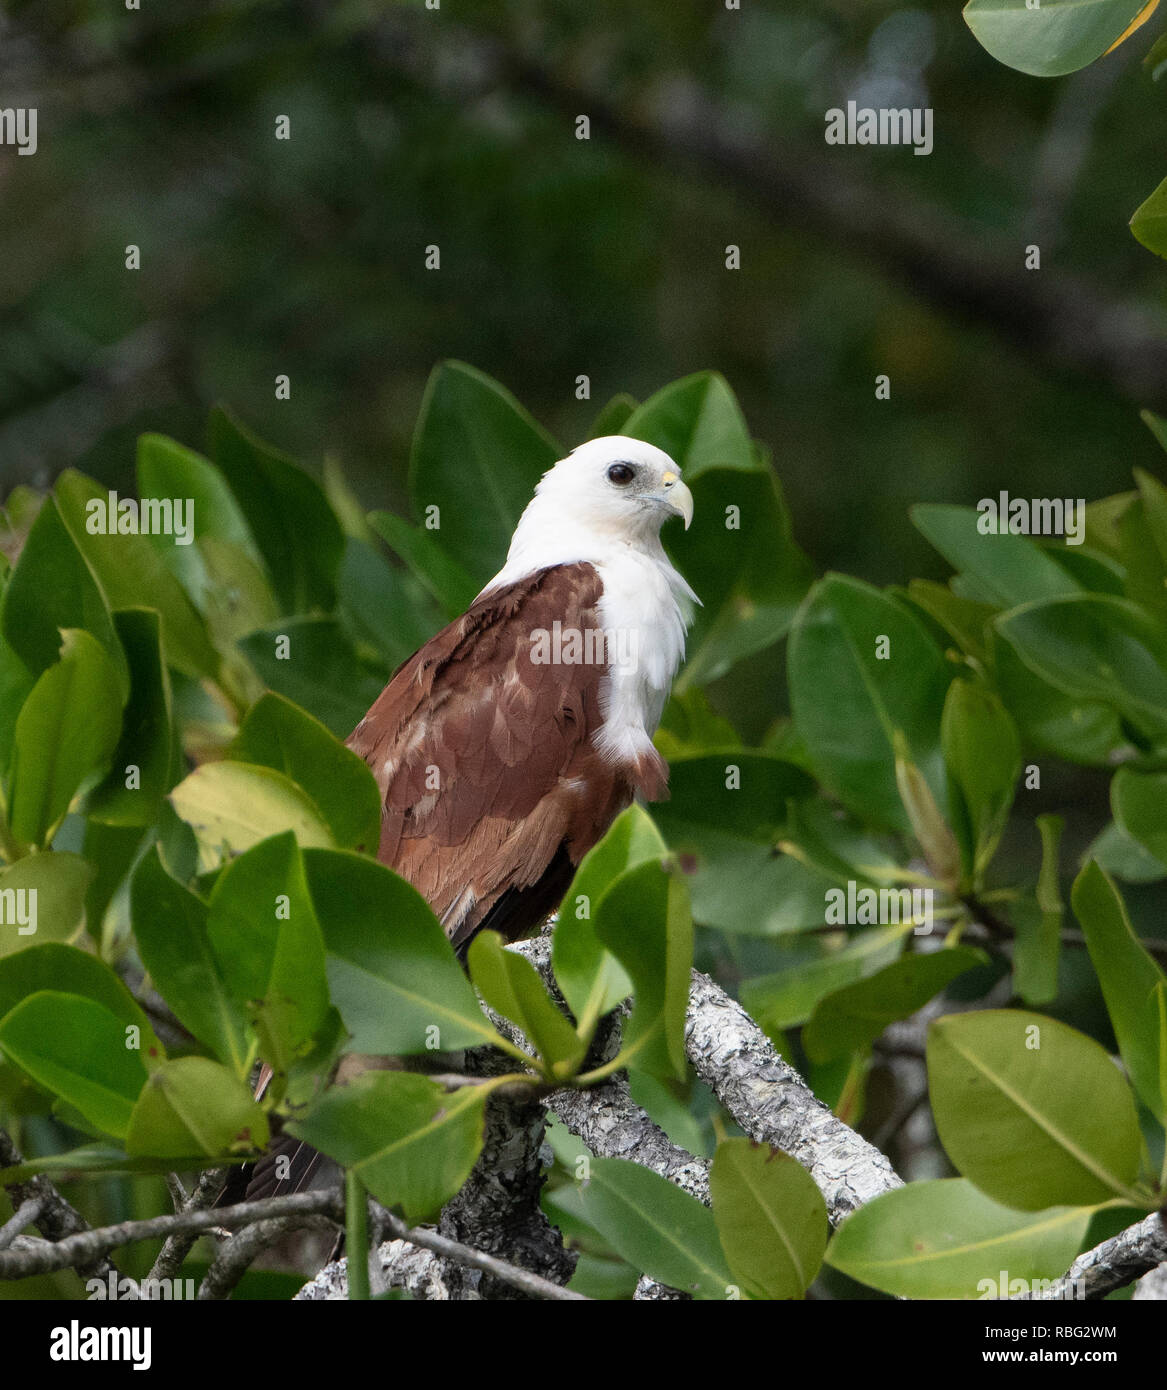 Daintree National Park Wet Tropics Far North Queensland Fnq Qld Australia Stock Photo Alamy